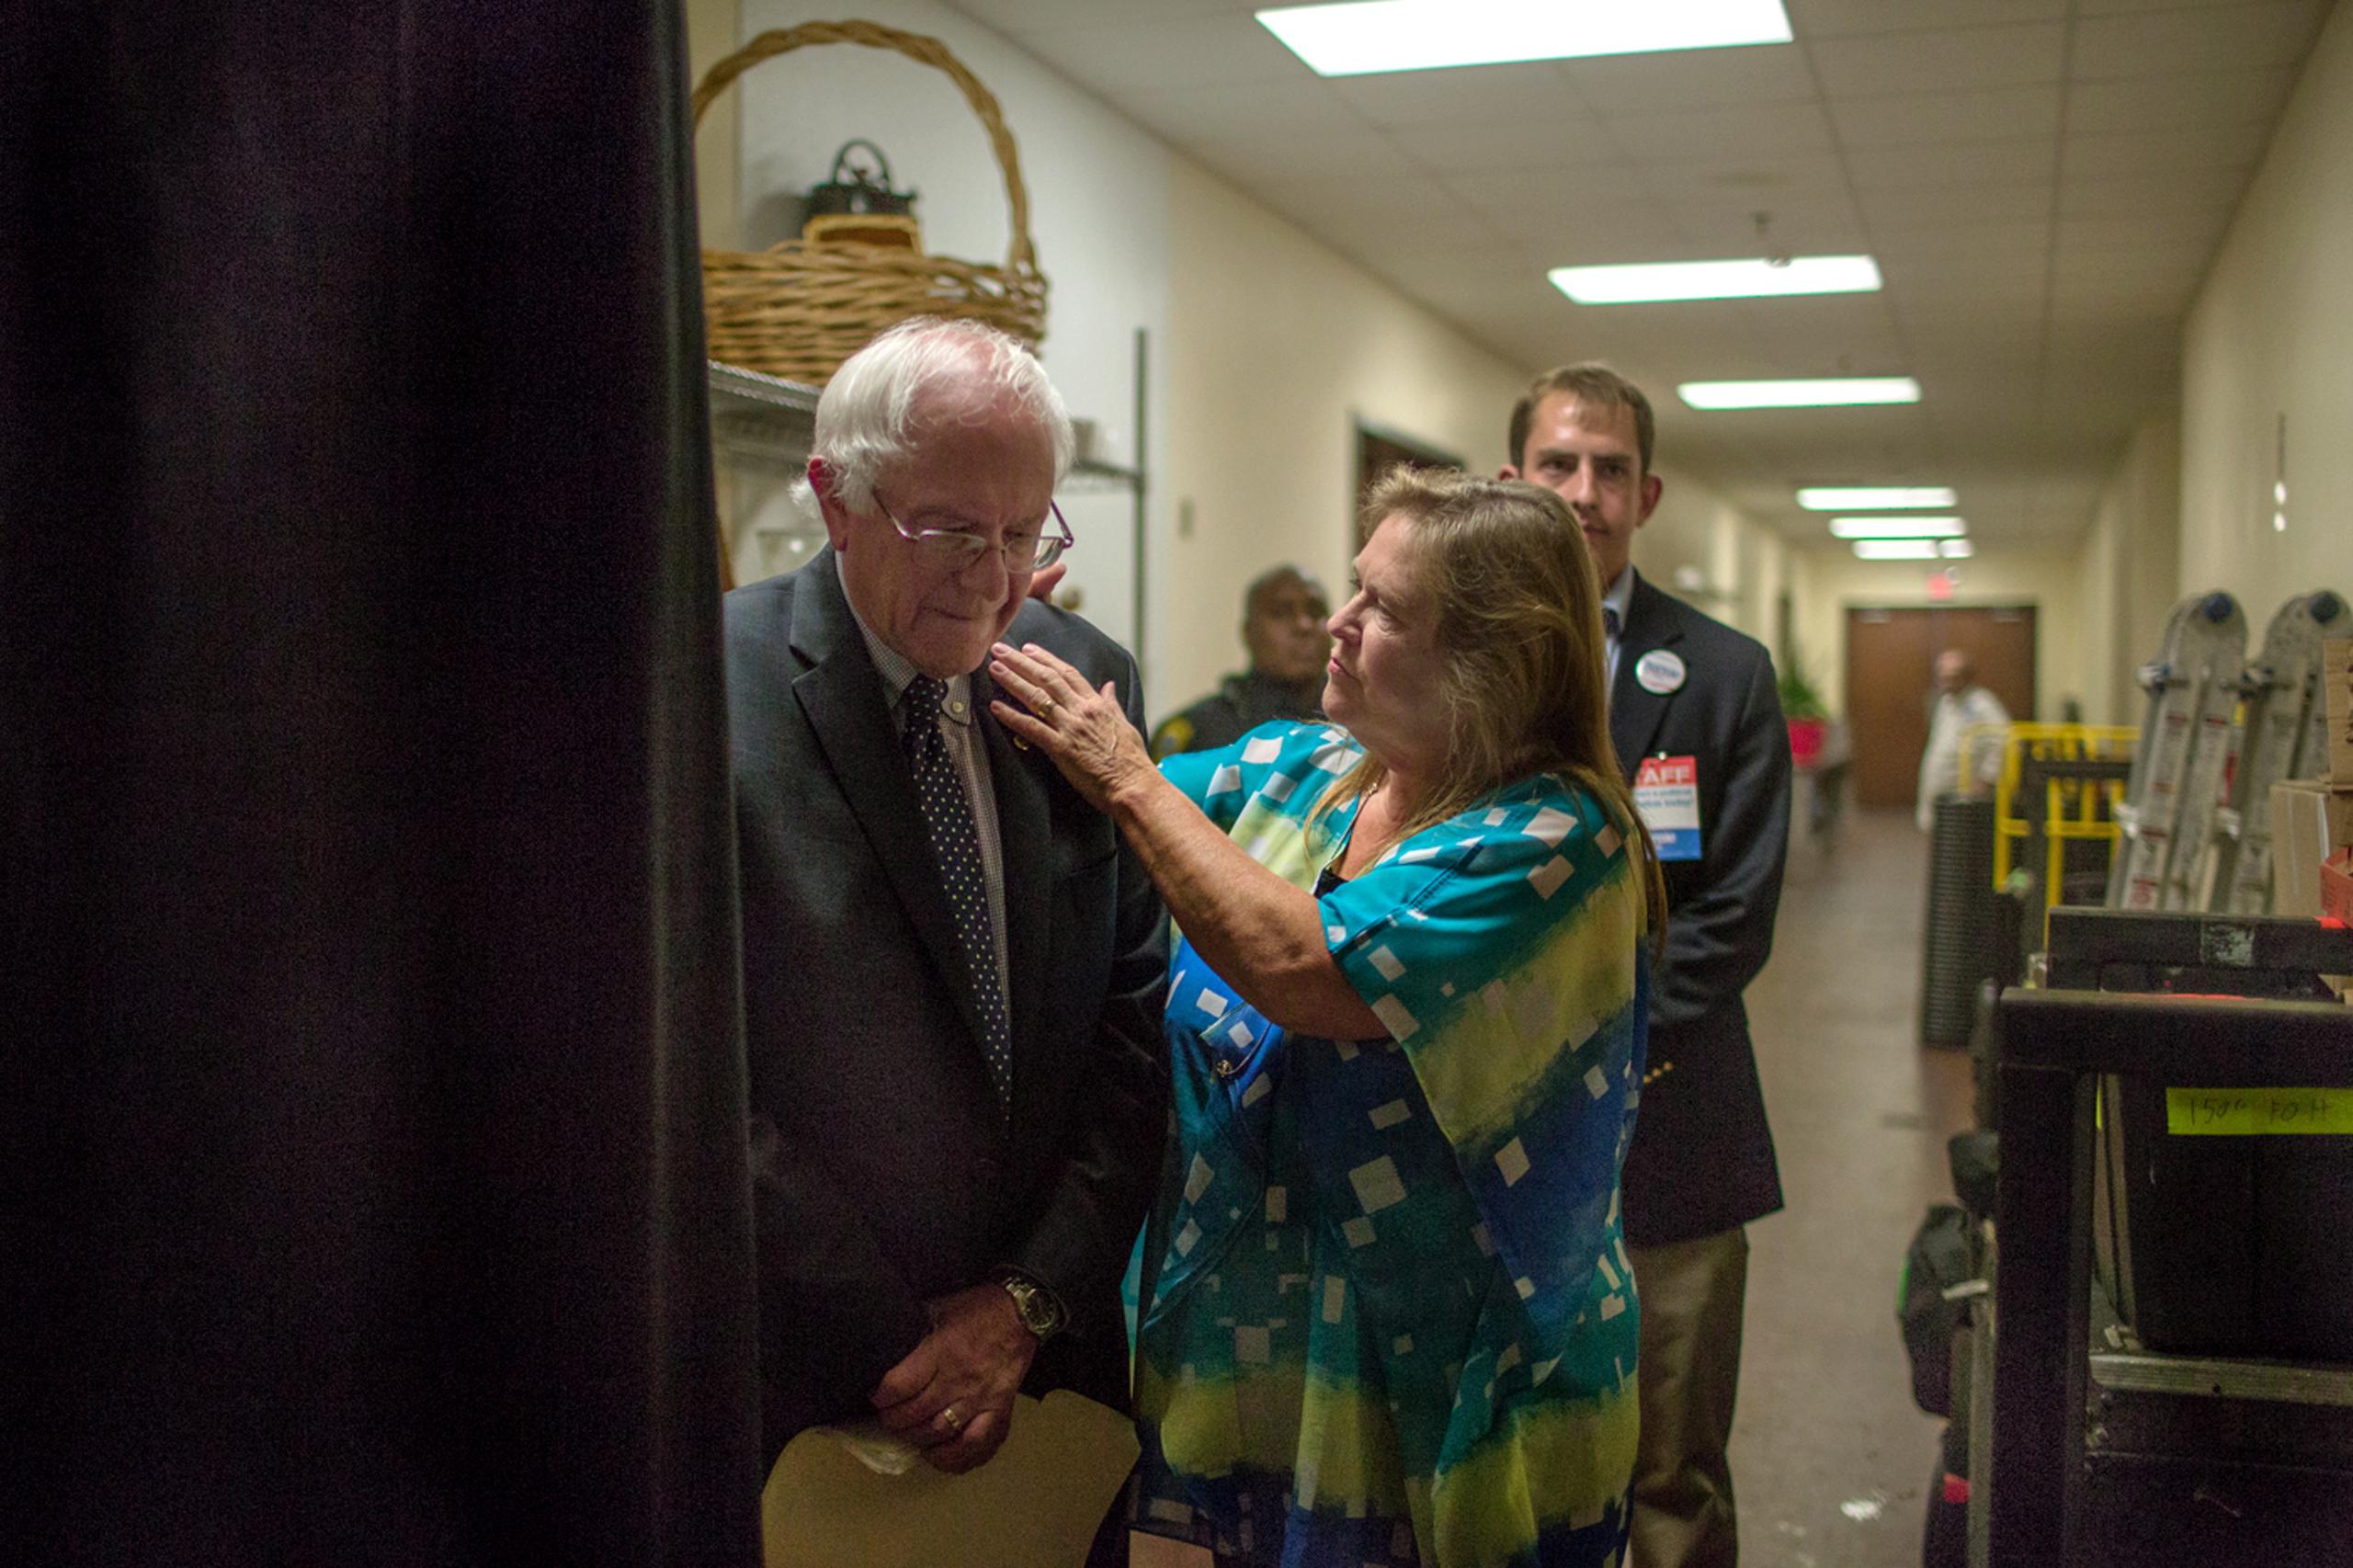 Jane O'Meara Sanders helps her husband, Sen. Bernie Sanders, prepare for a rally in Columbia, S.C., Aug. 21, 2015.